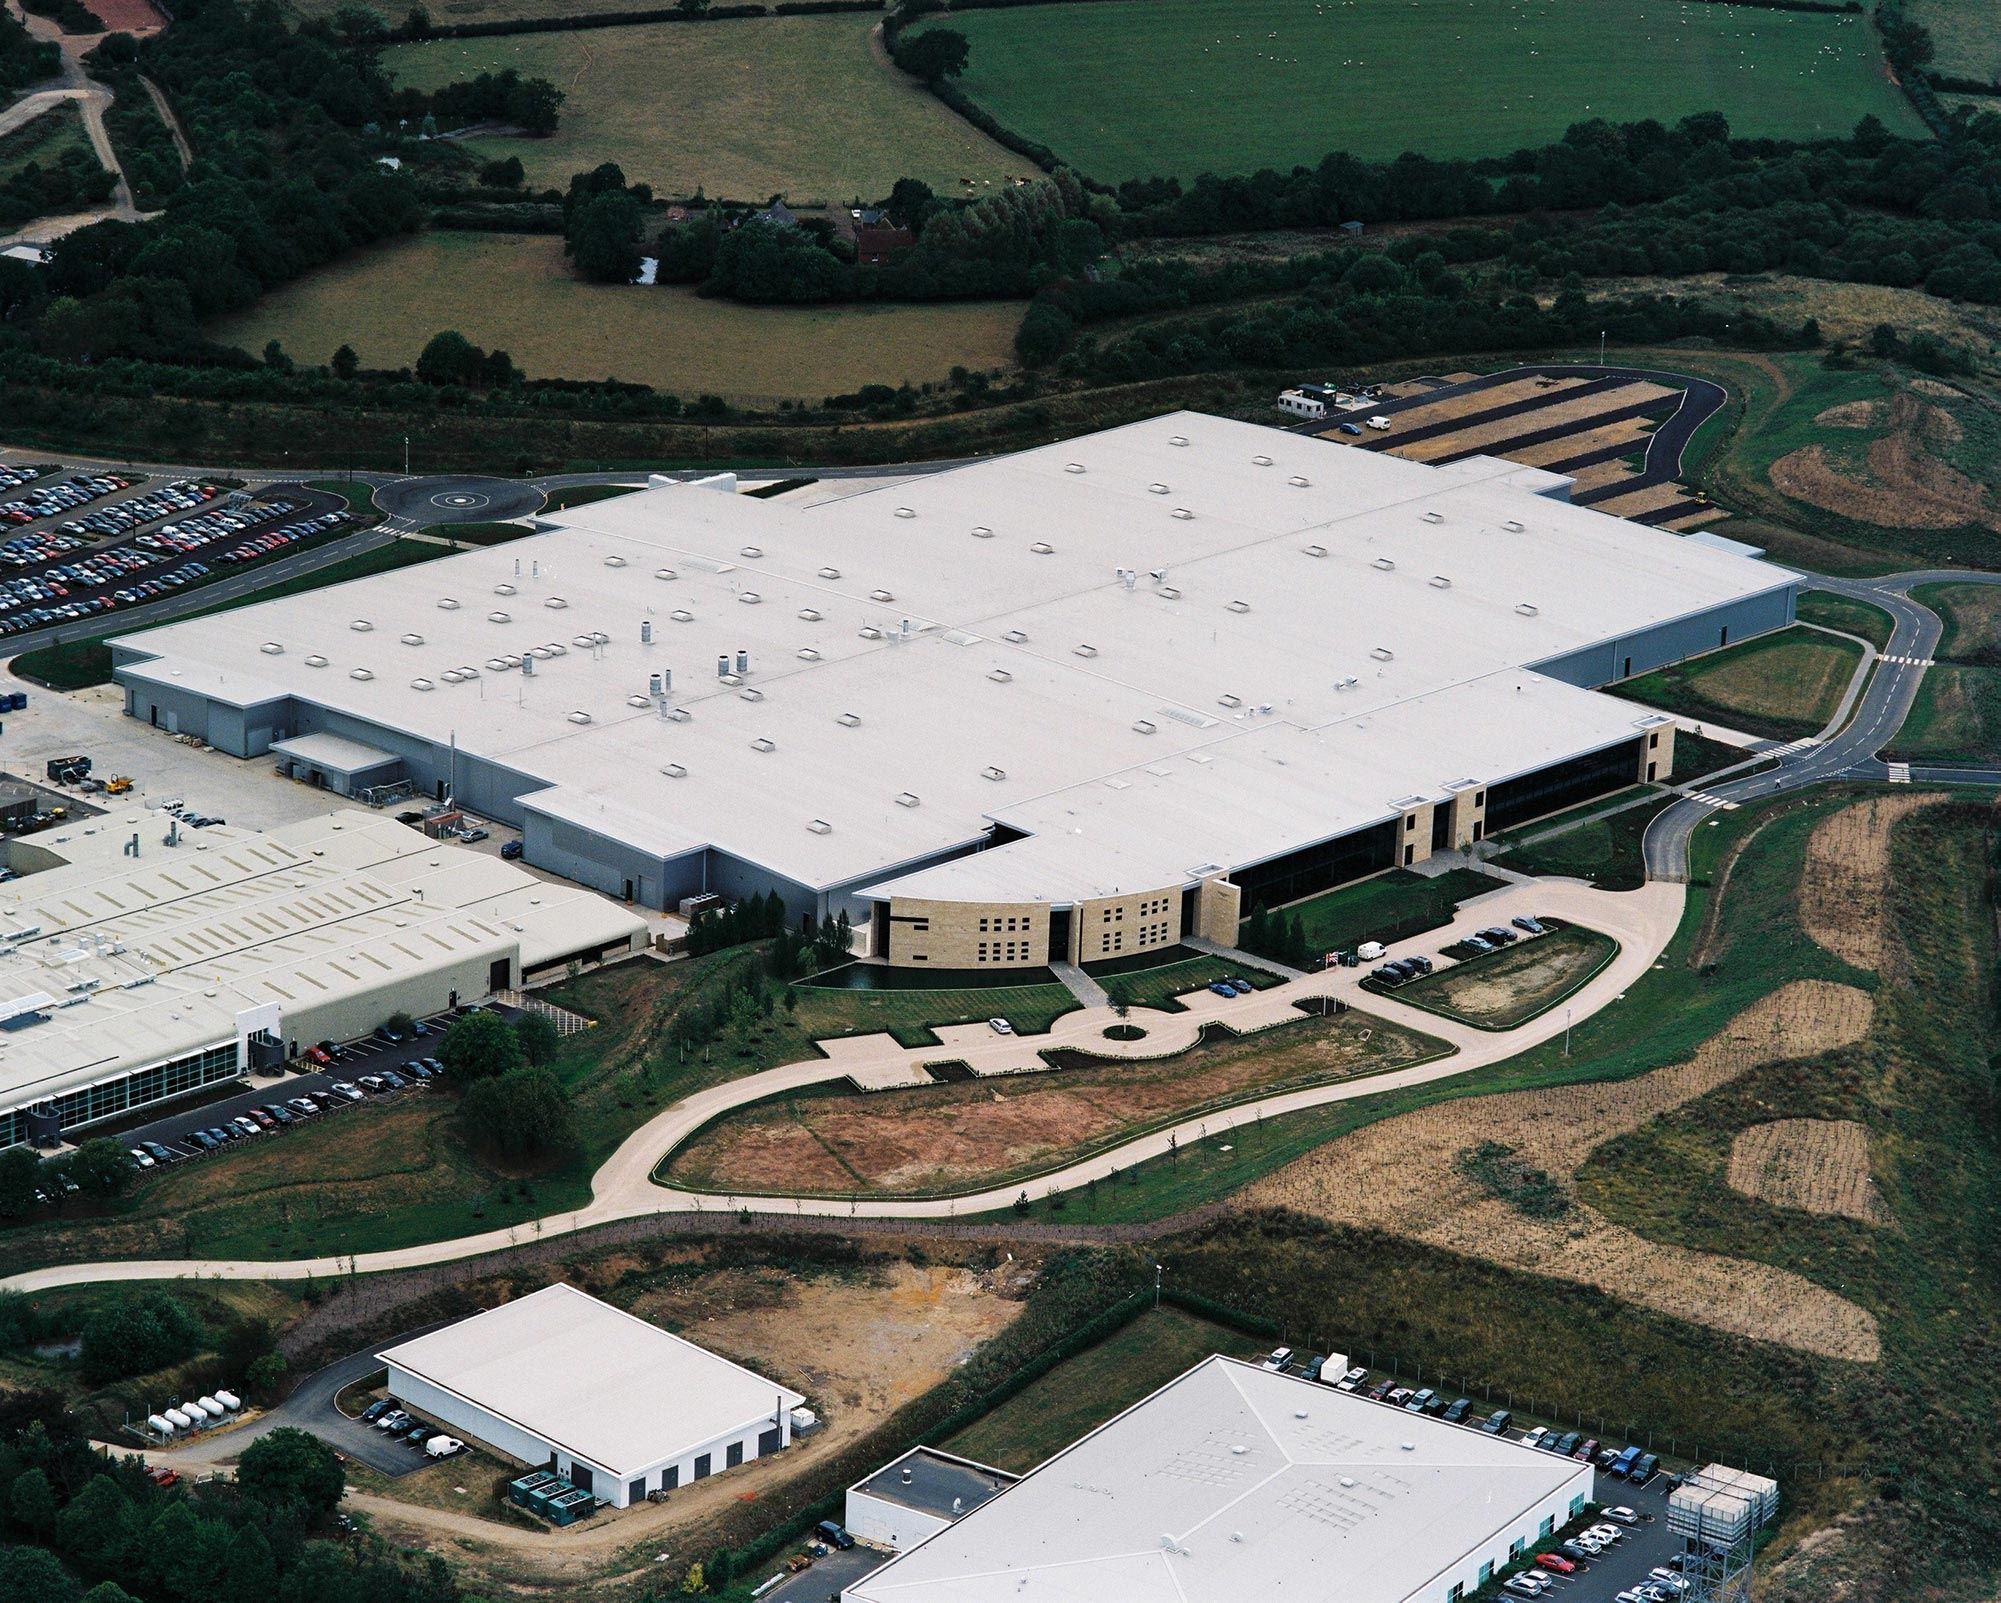 Aston Martin Lagonda Facility Sdc